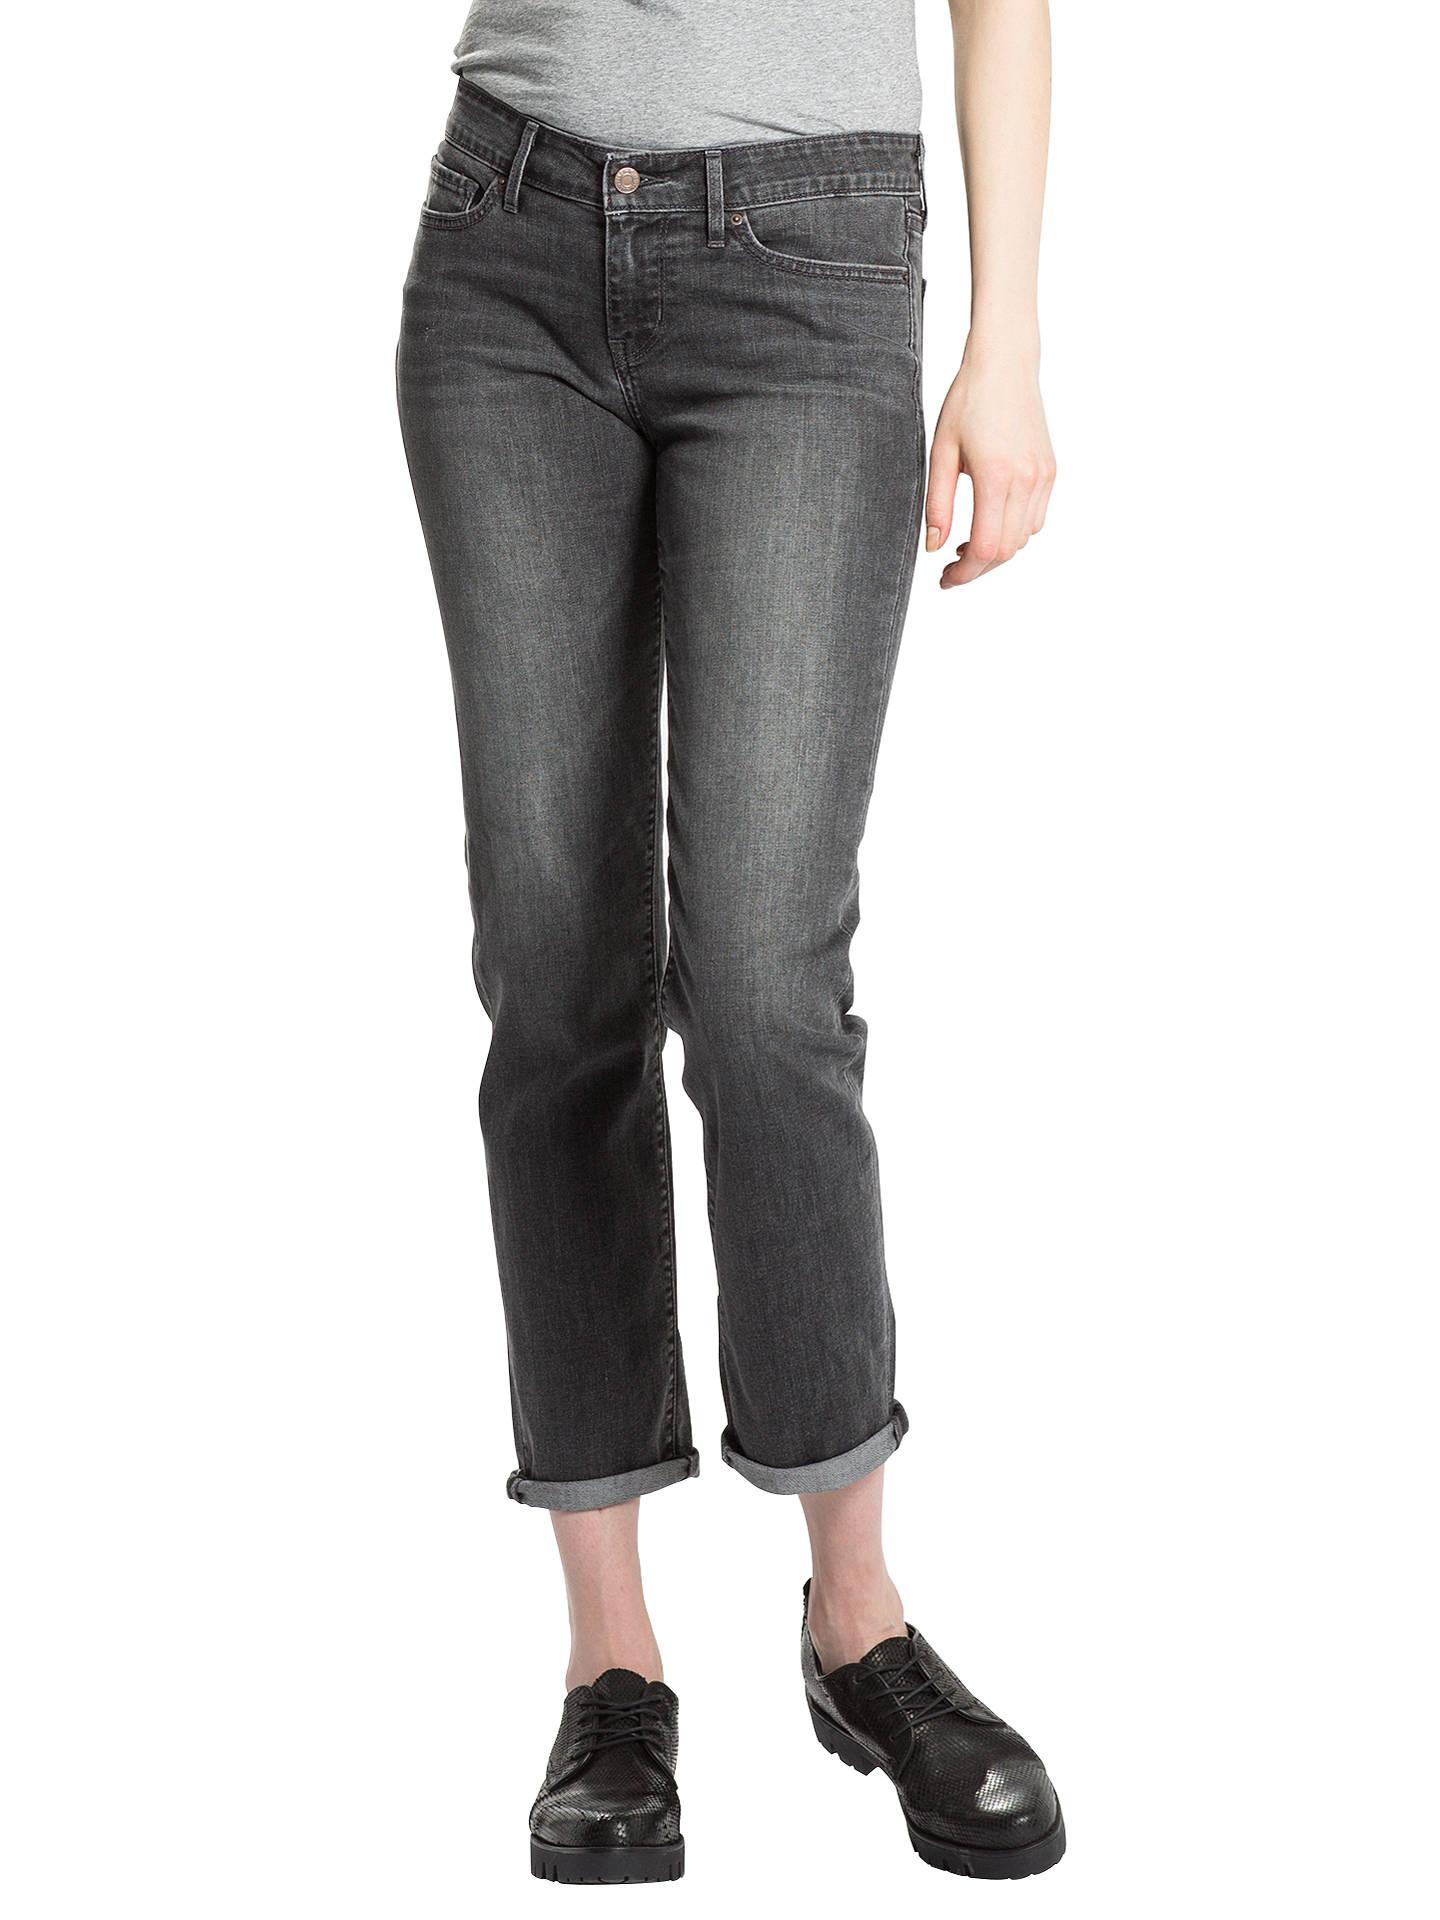 Slim John amp; 712 Levi's Burnt Jeans Mid Ash Lewis At Partners Rise q8Hwtpr8